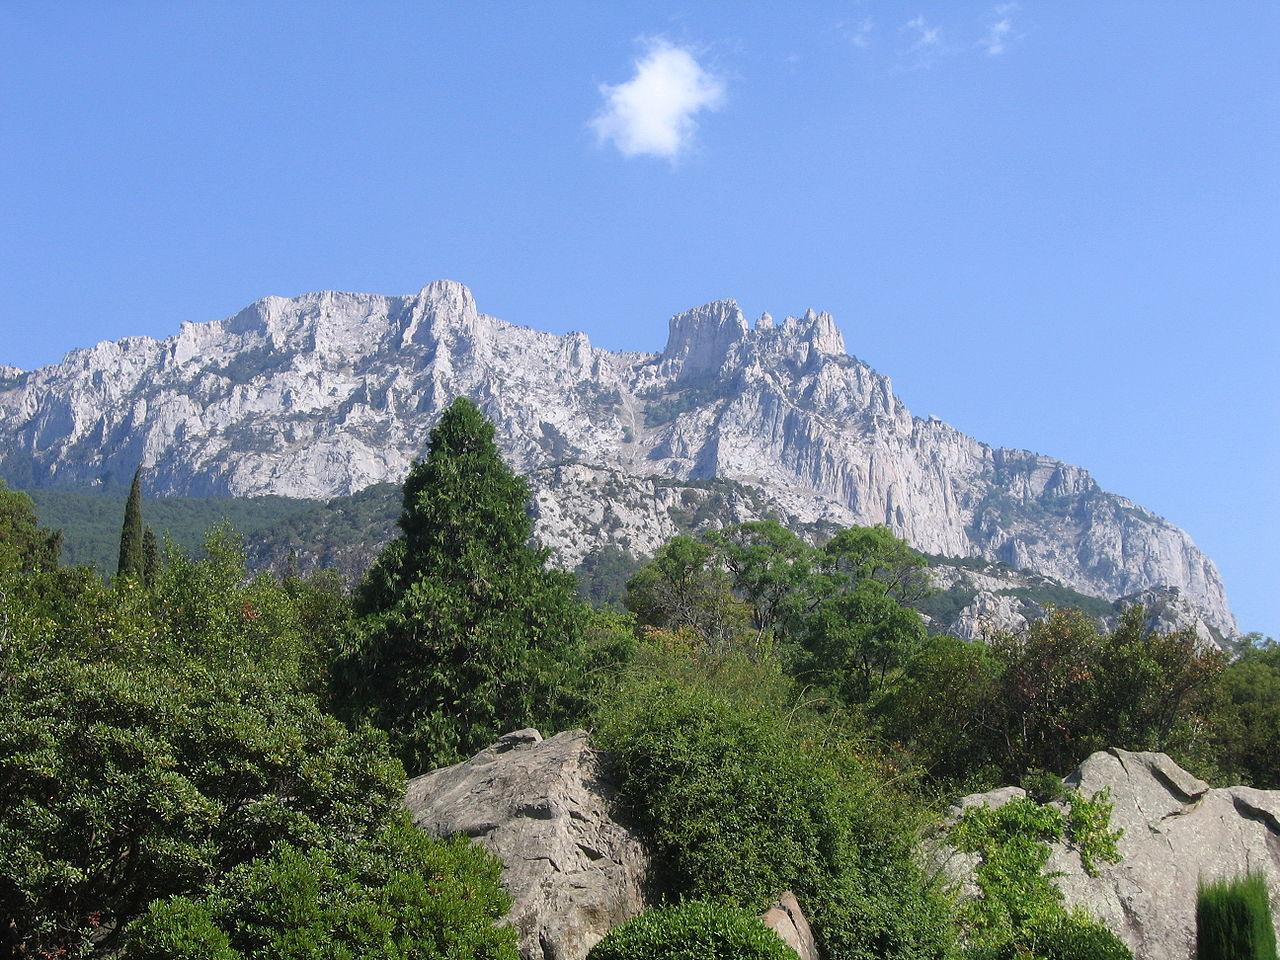 Гора Ай-Петри в ясную погоду